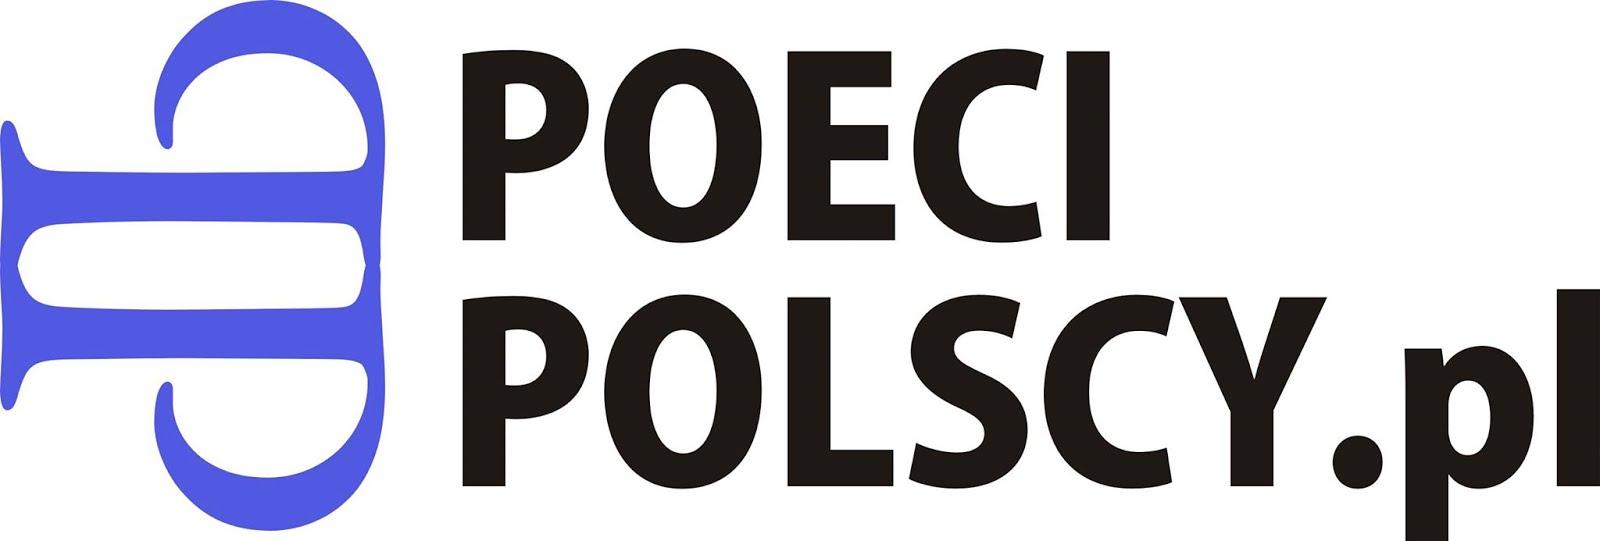 Poeci Polscy